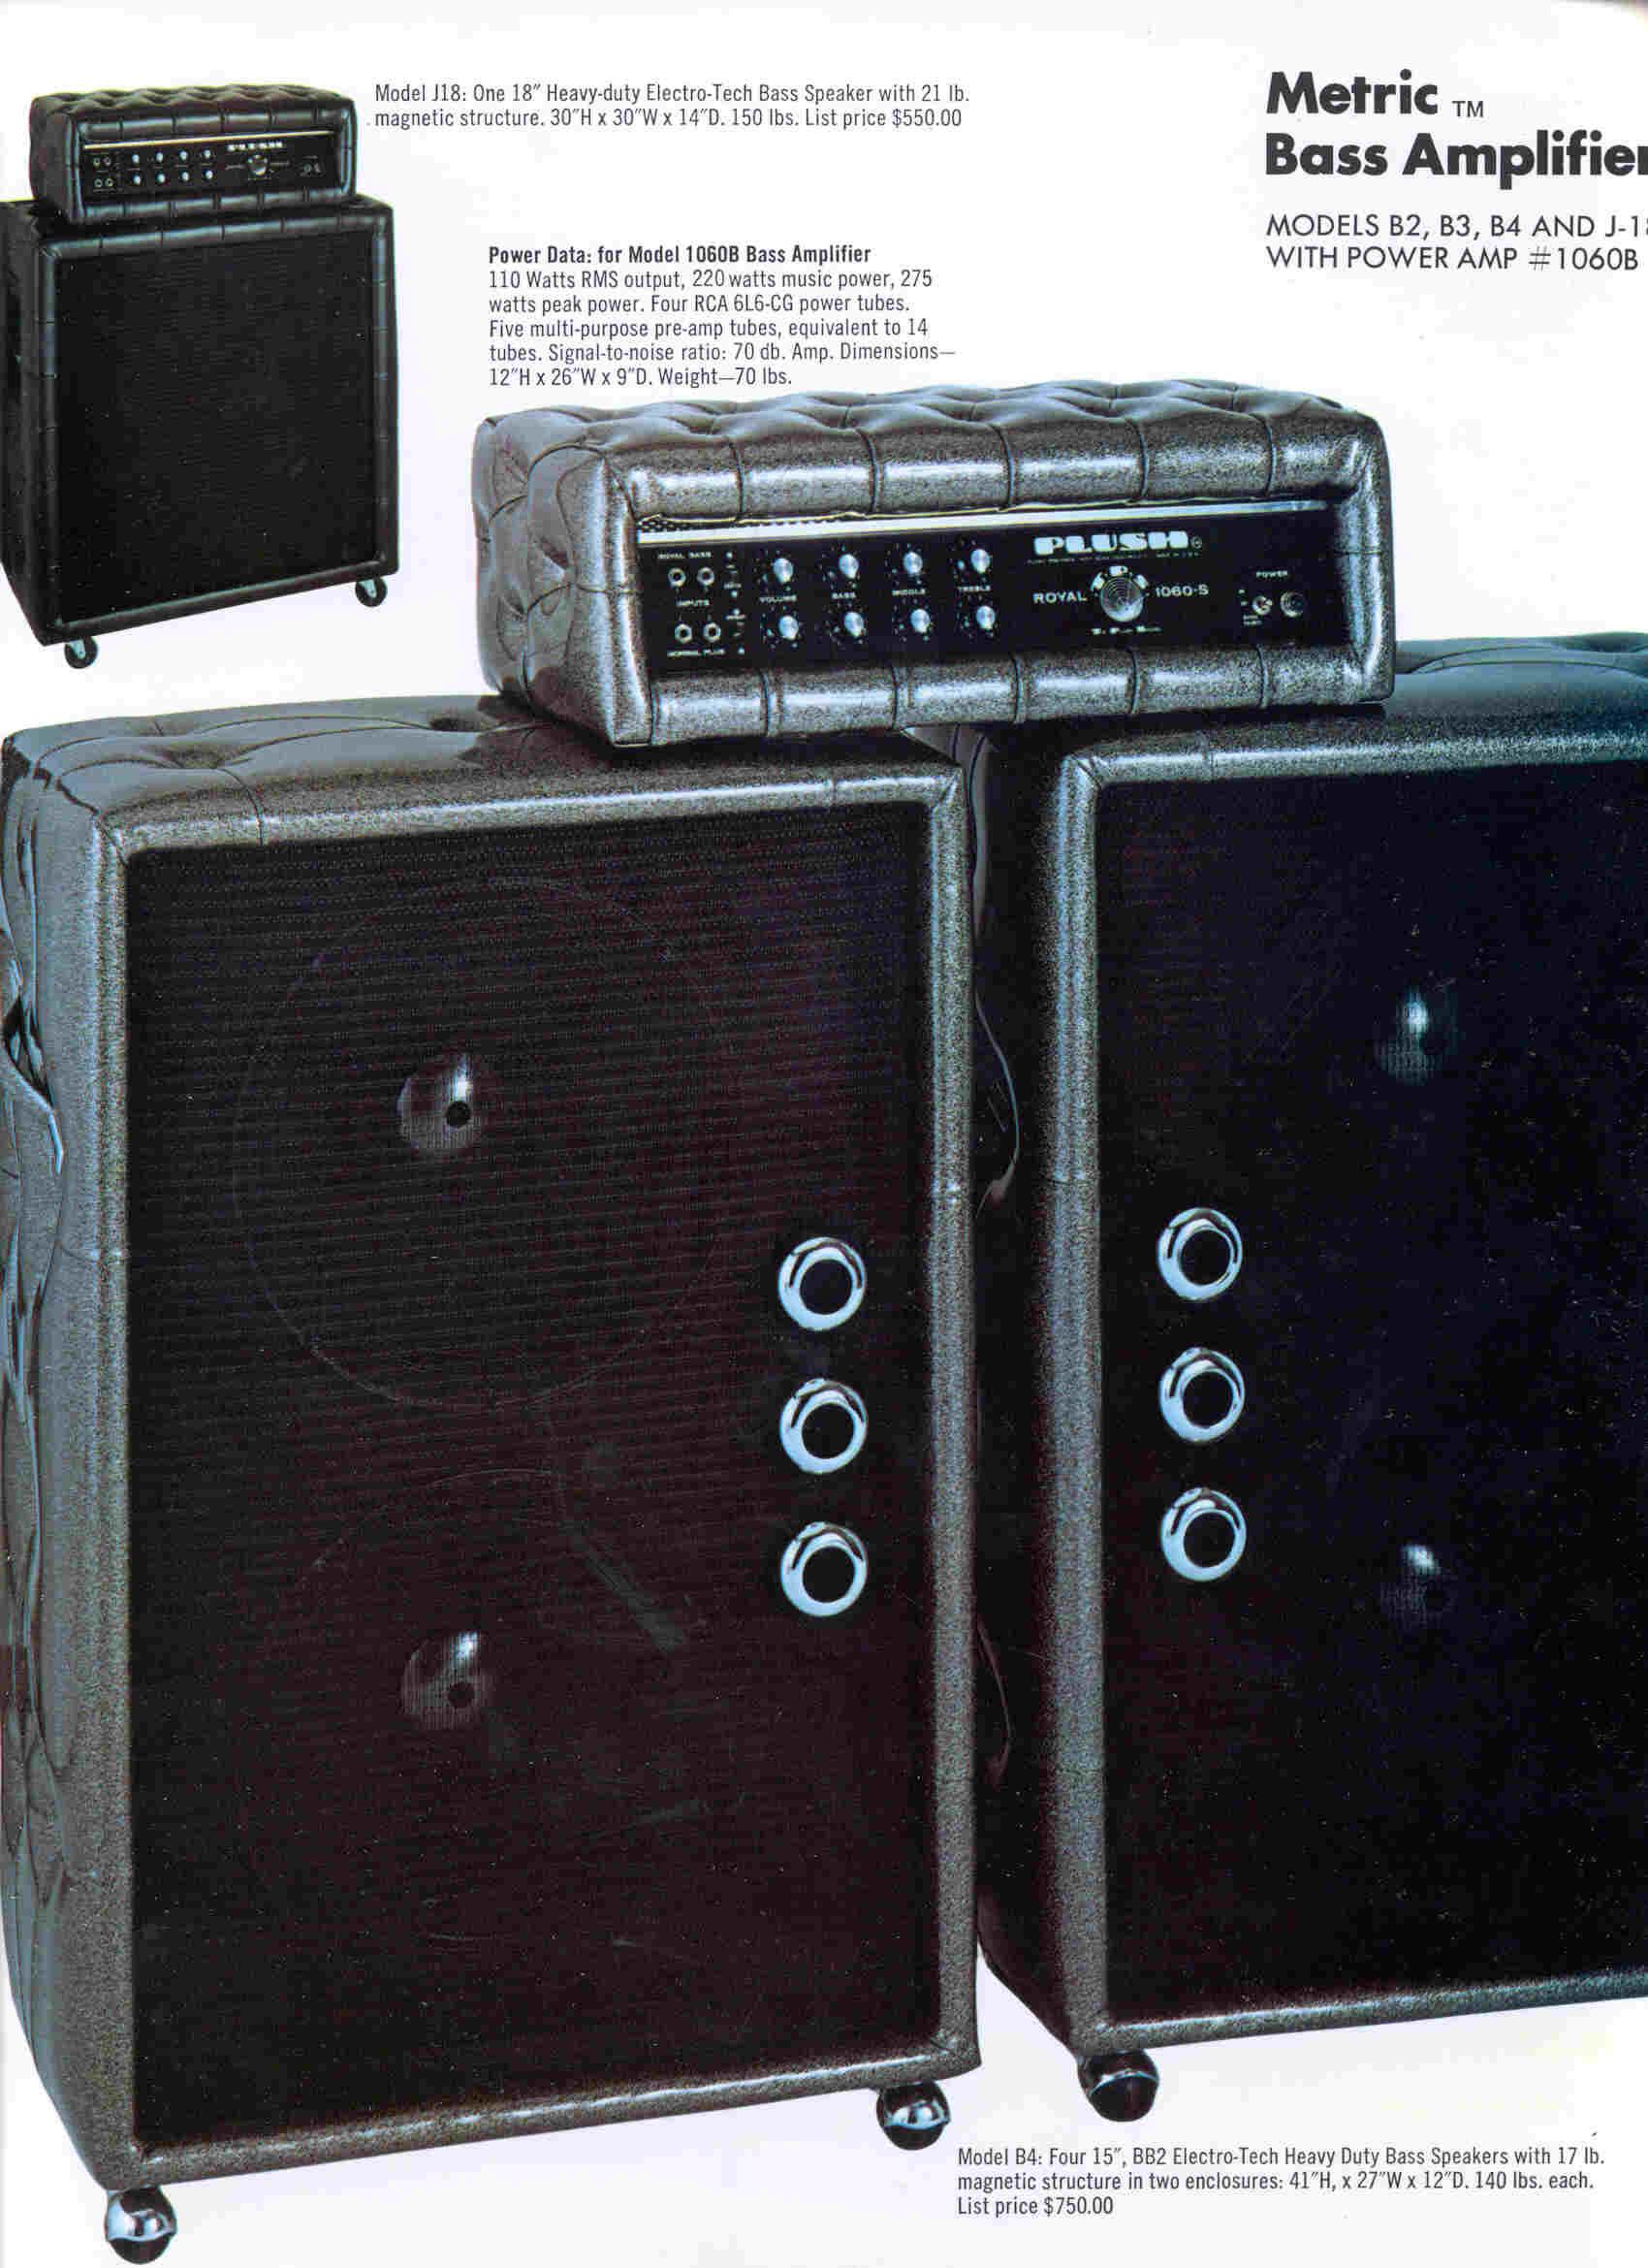 plush royal 1060 s 100watt tube 1970 black amp for sale hendrix guitars. Black Bedroom Furniture Sets. Home Design Ideas